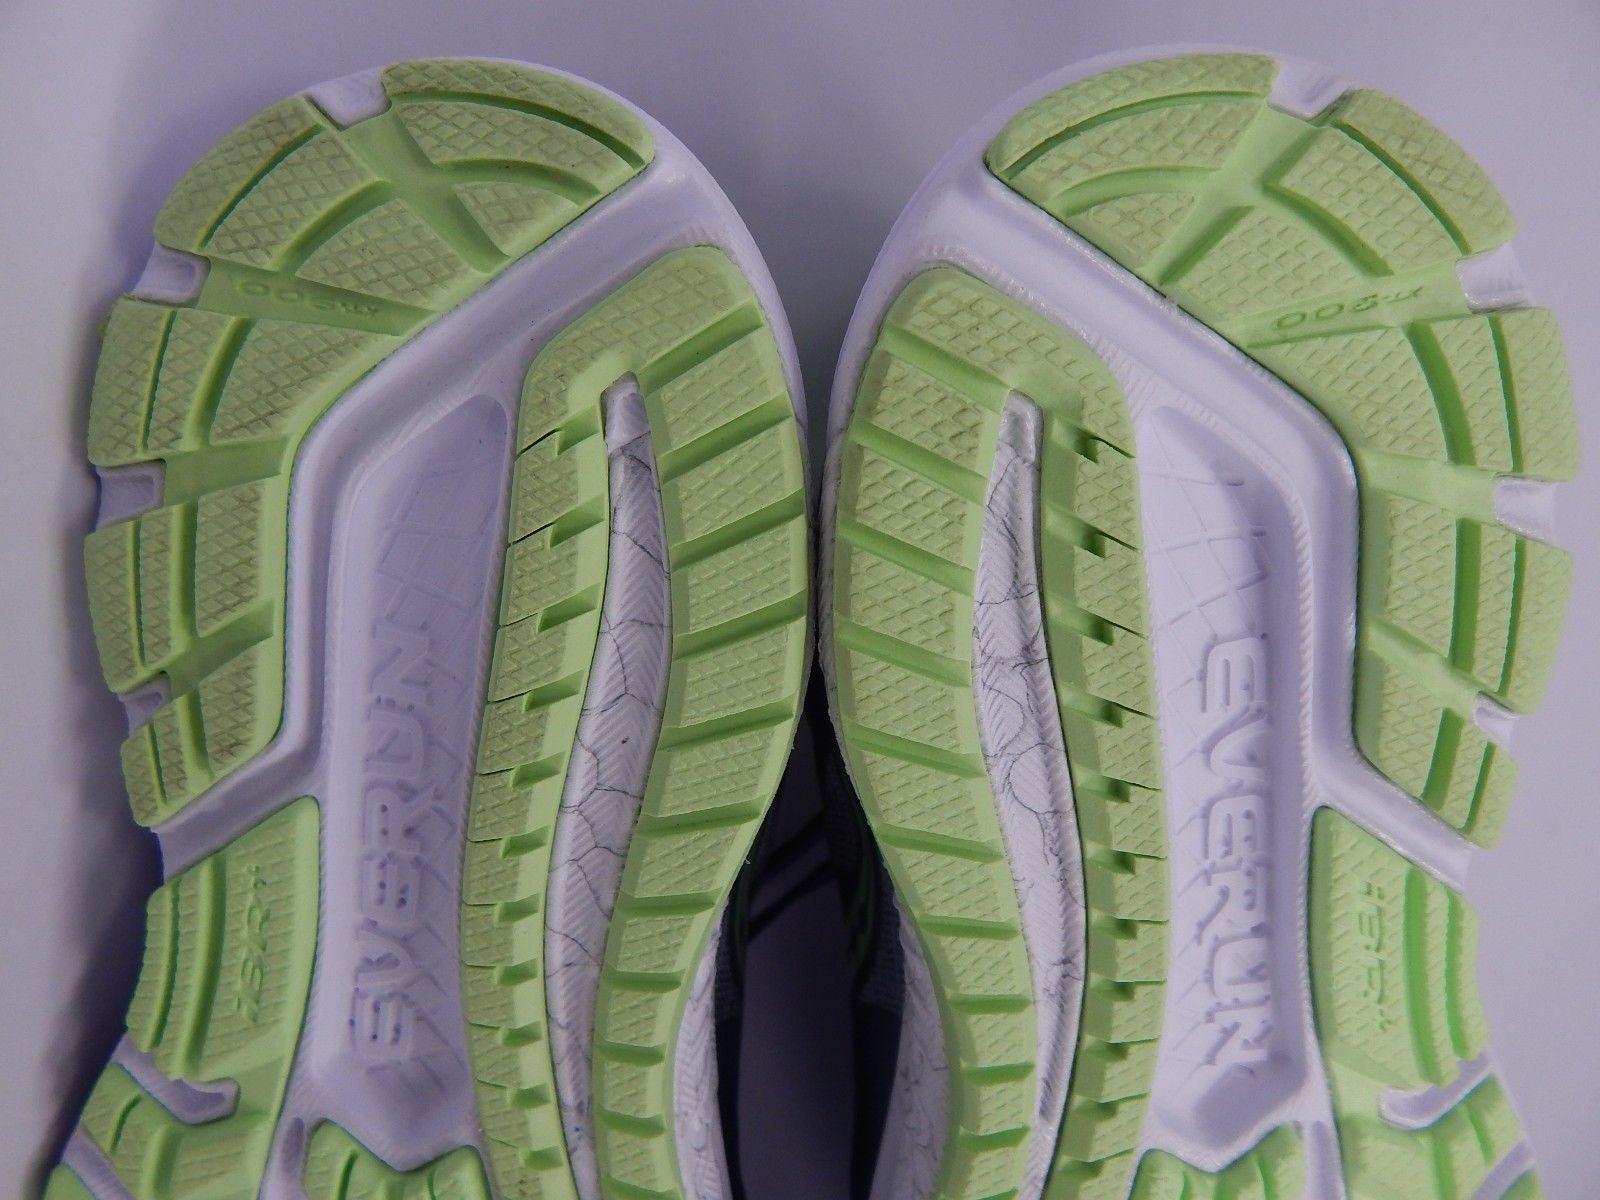 Saucony Guide ISO Size 8 M (B) EU 39 Women's Running Shoes Purple S10415-1